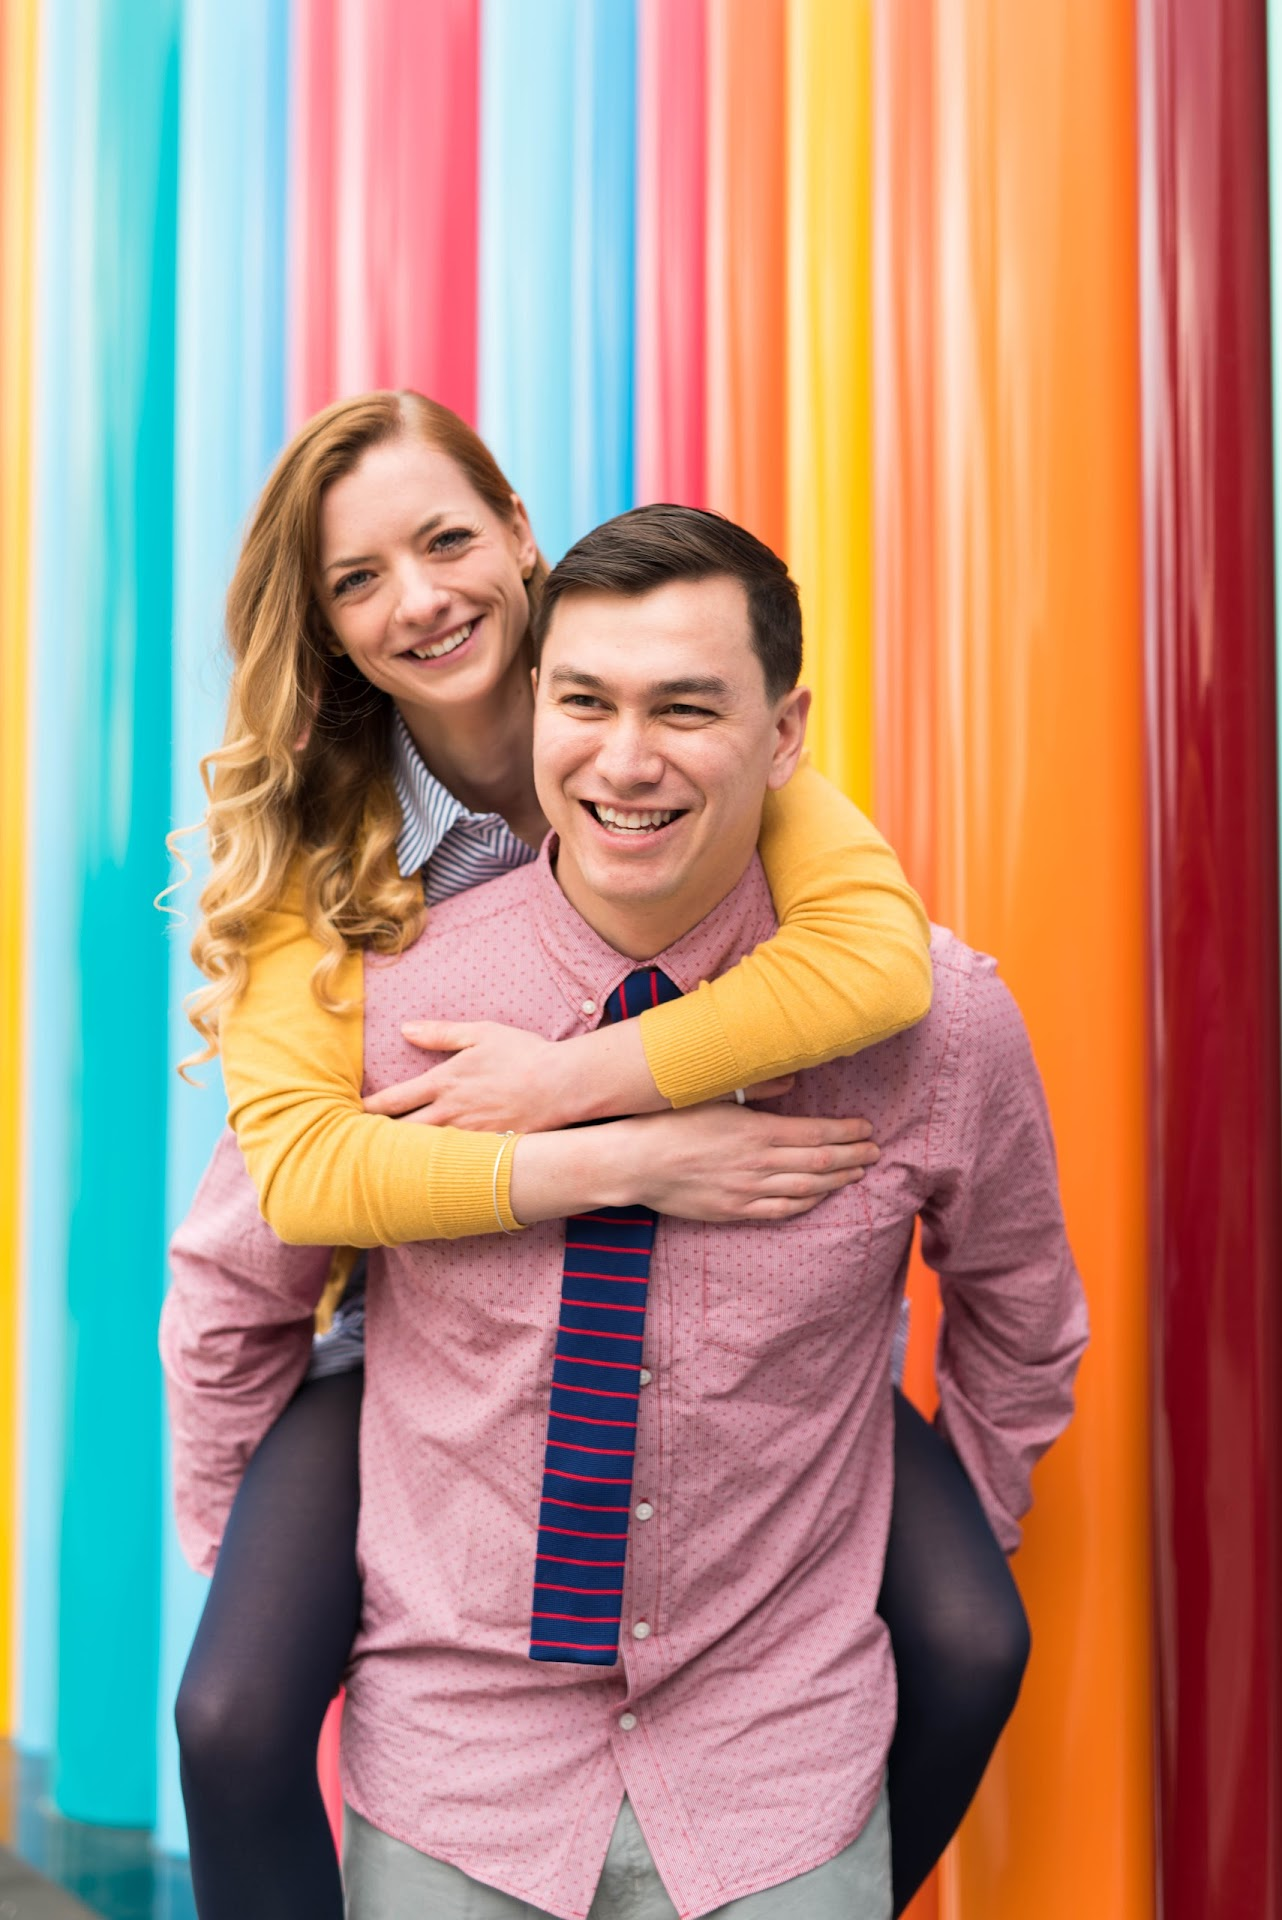 engagement photography, photos, las vegas photographer, photo spot in las vegas, off the strip, wedding, couple, engagement photo poses